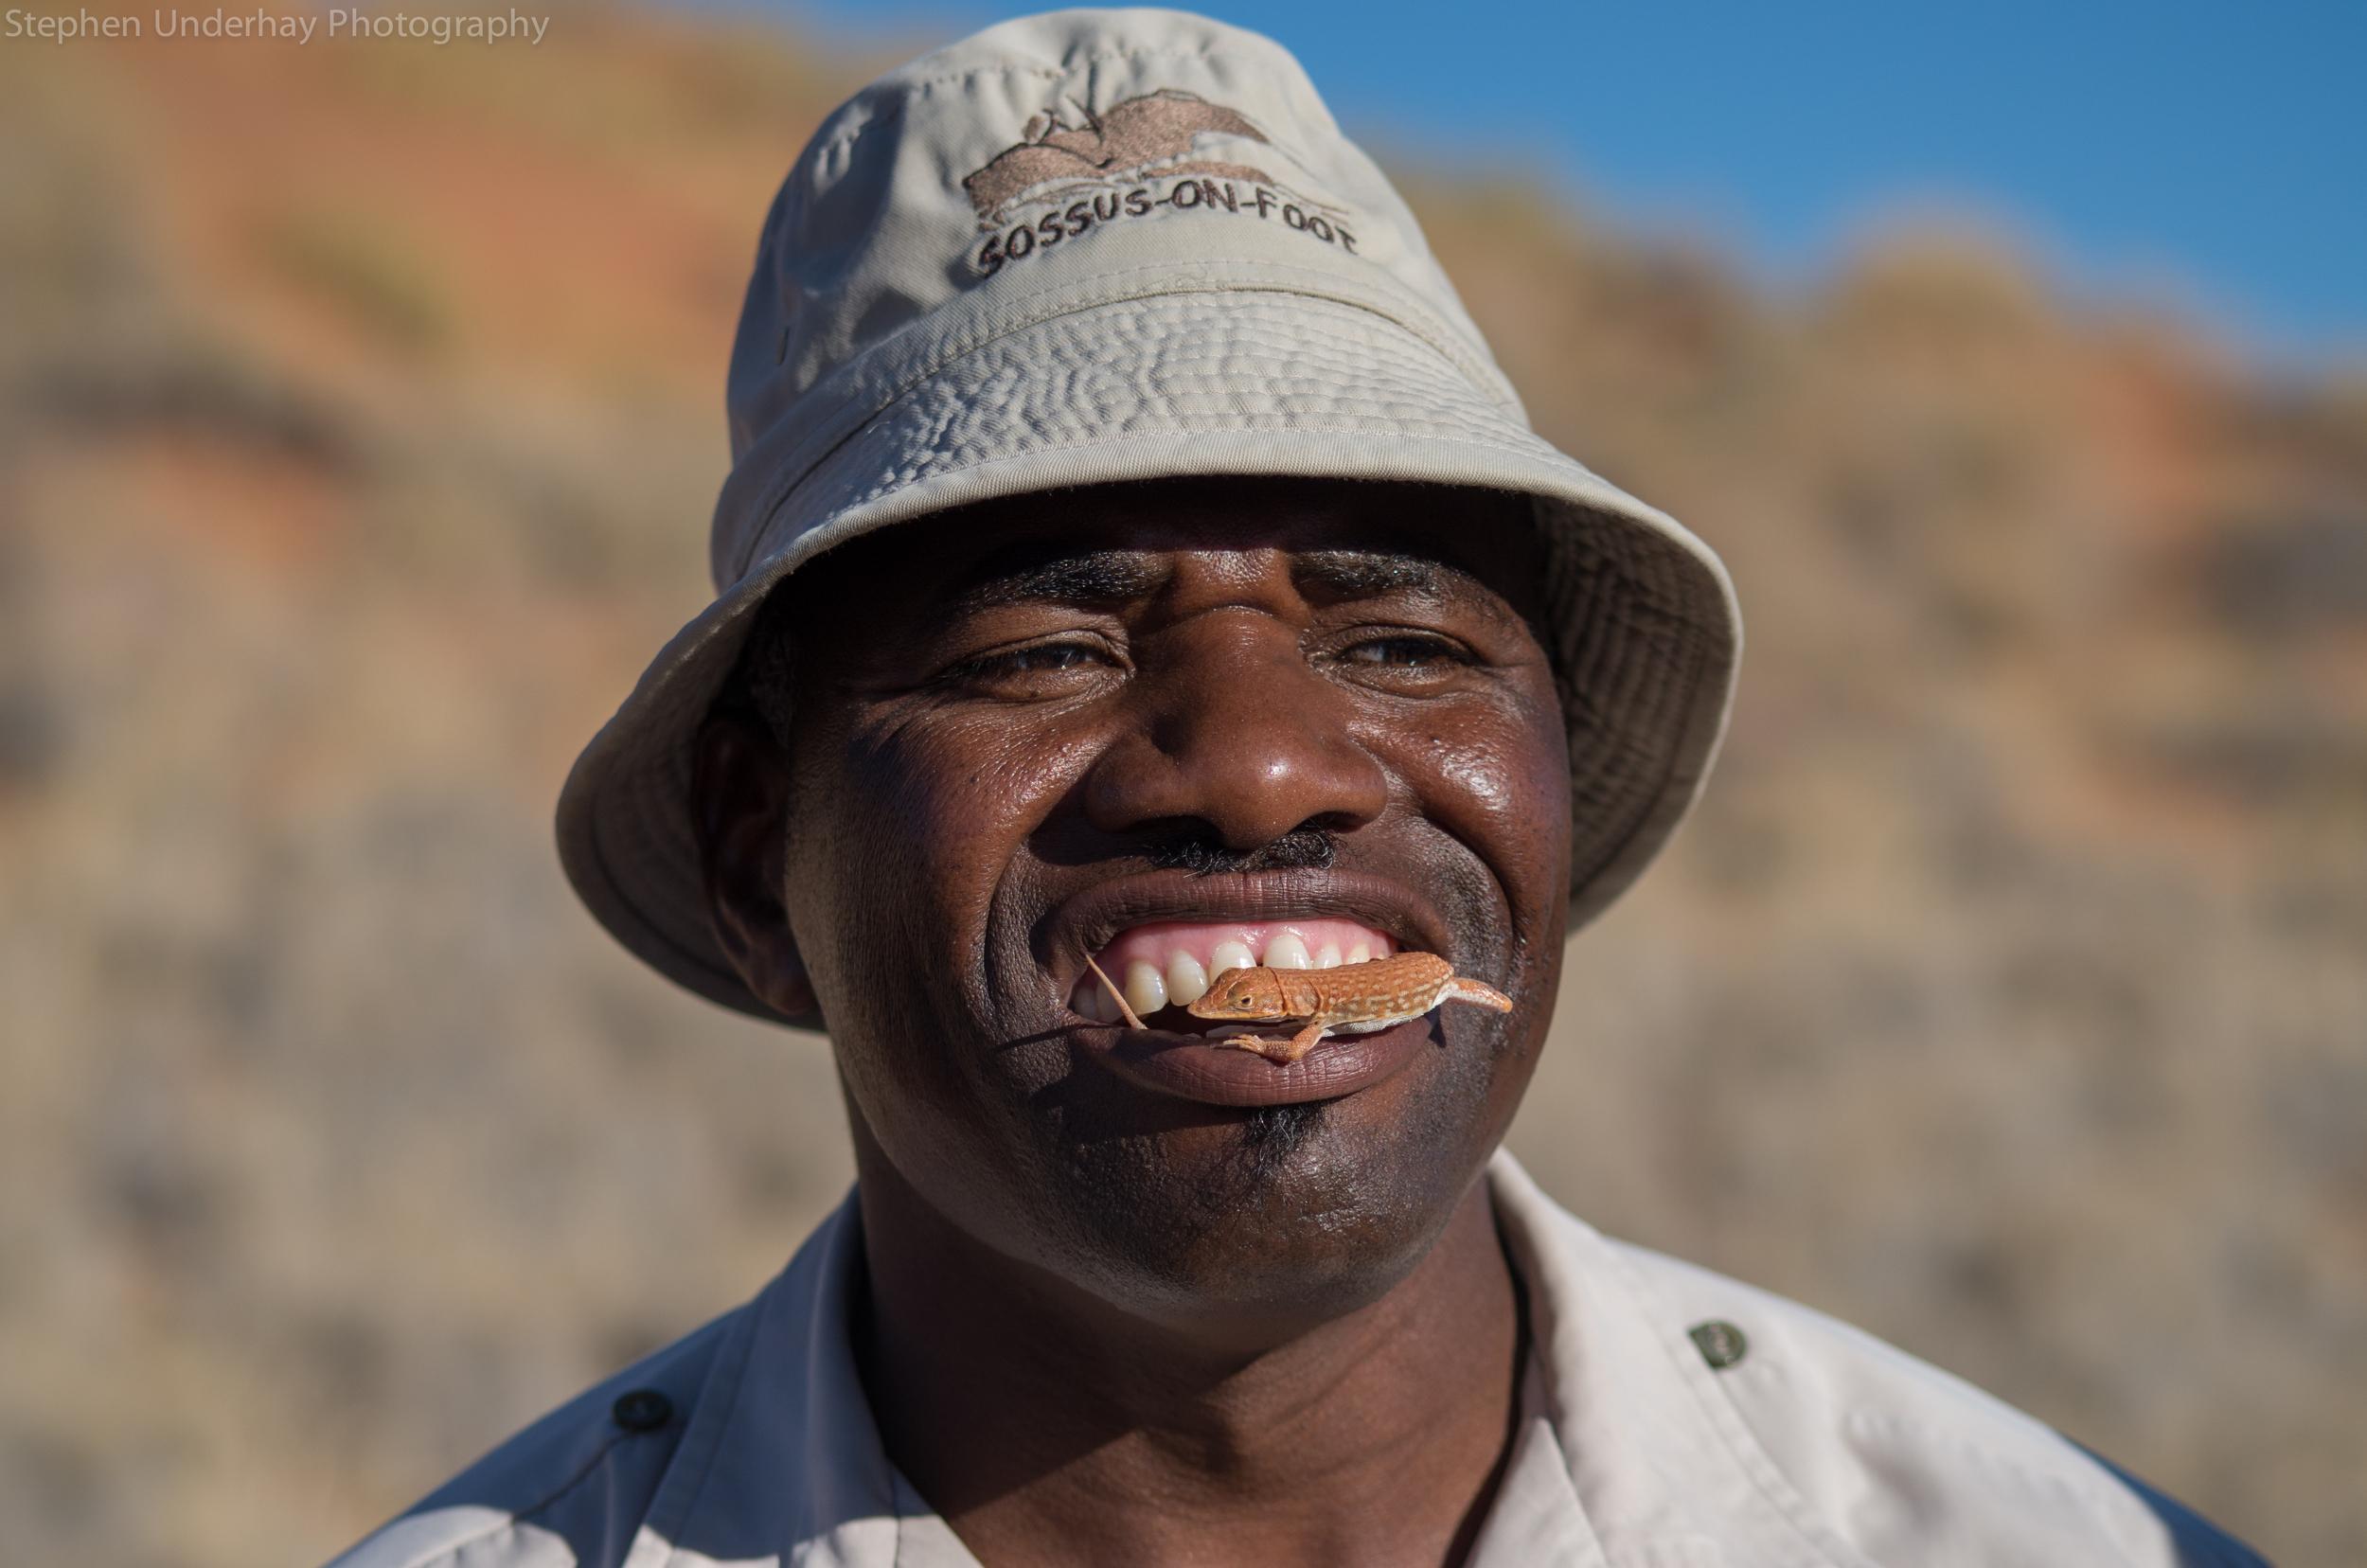 africa botswana journey thisworldexists this world exists stephen underhay